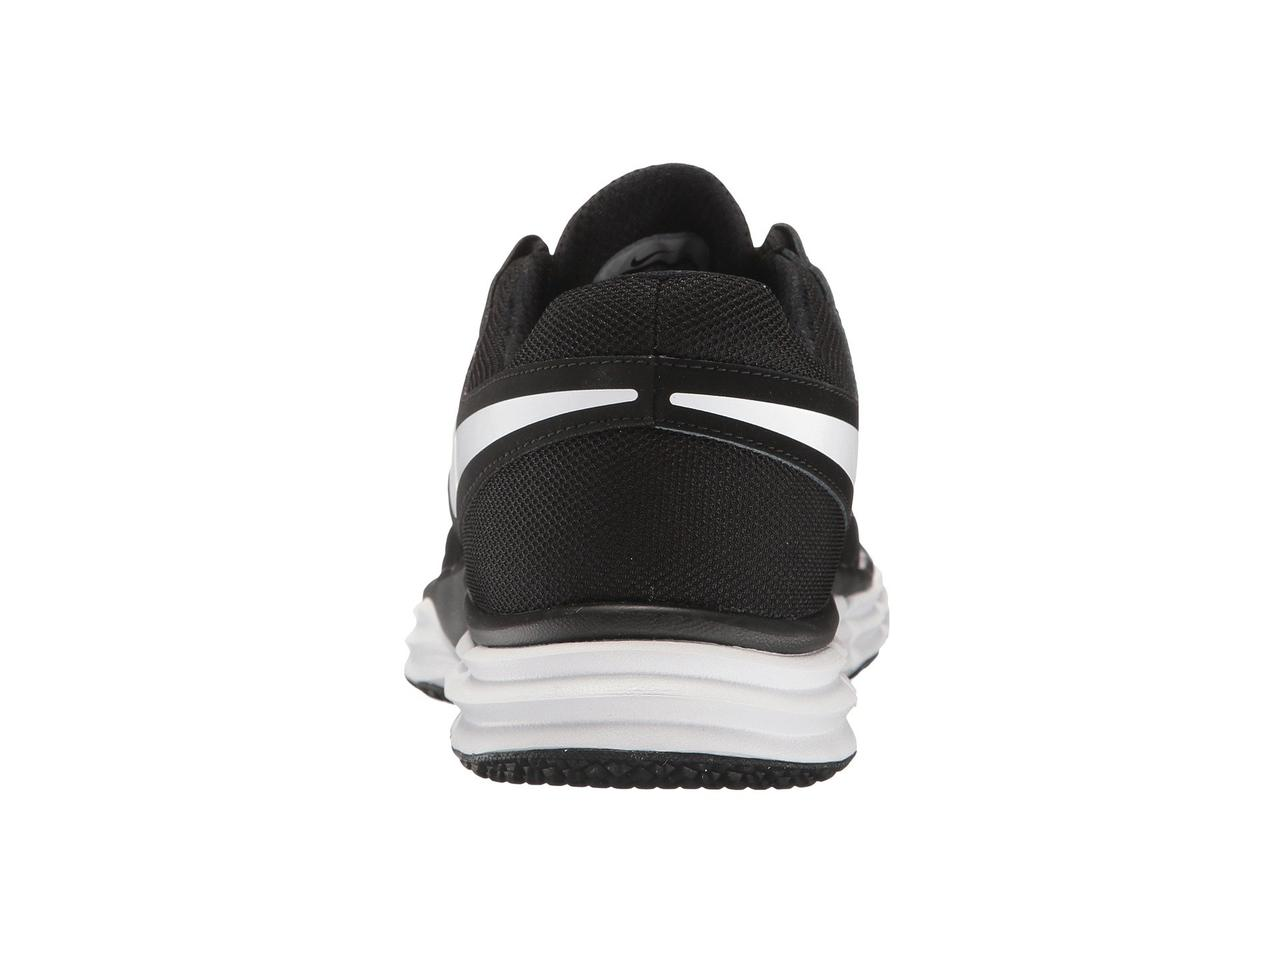 a17dbab317bb Кроссовки Кеды (Оригинал) Nike Lunar Fingertrap TR Black White ...